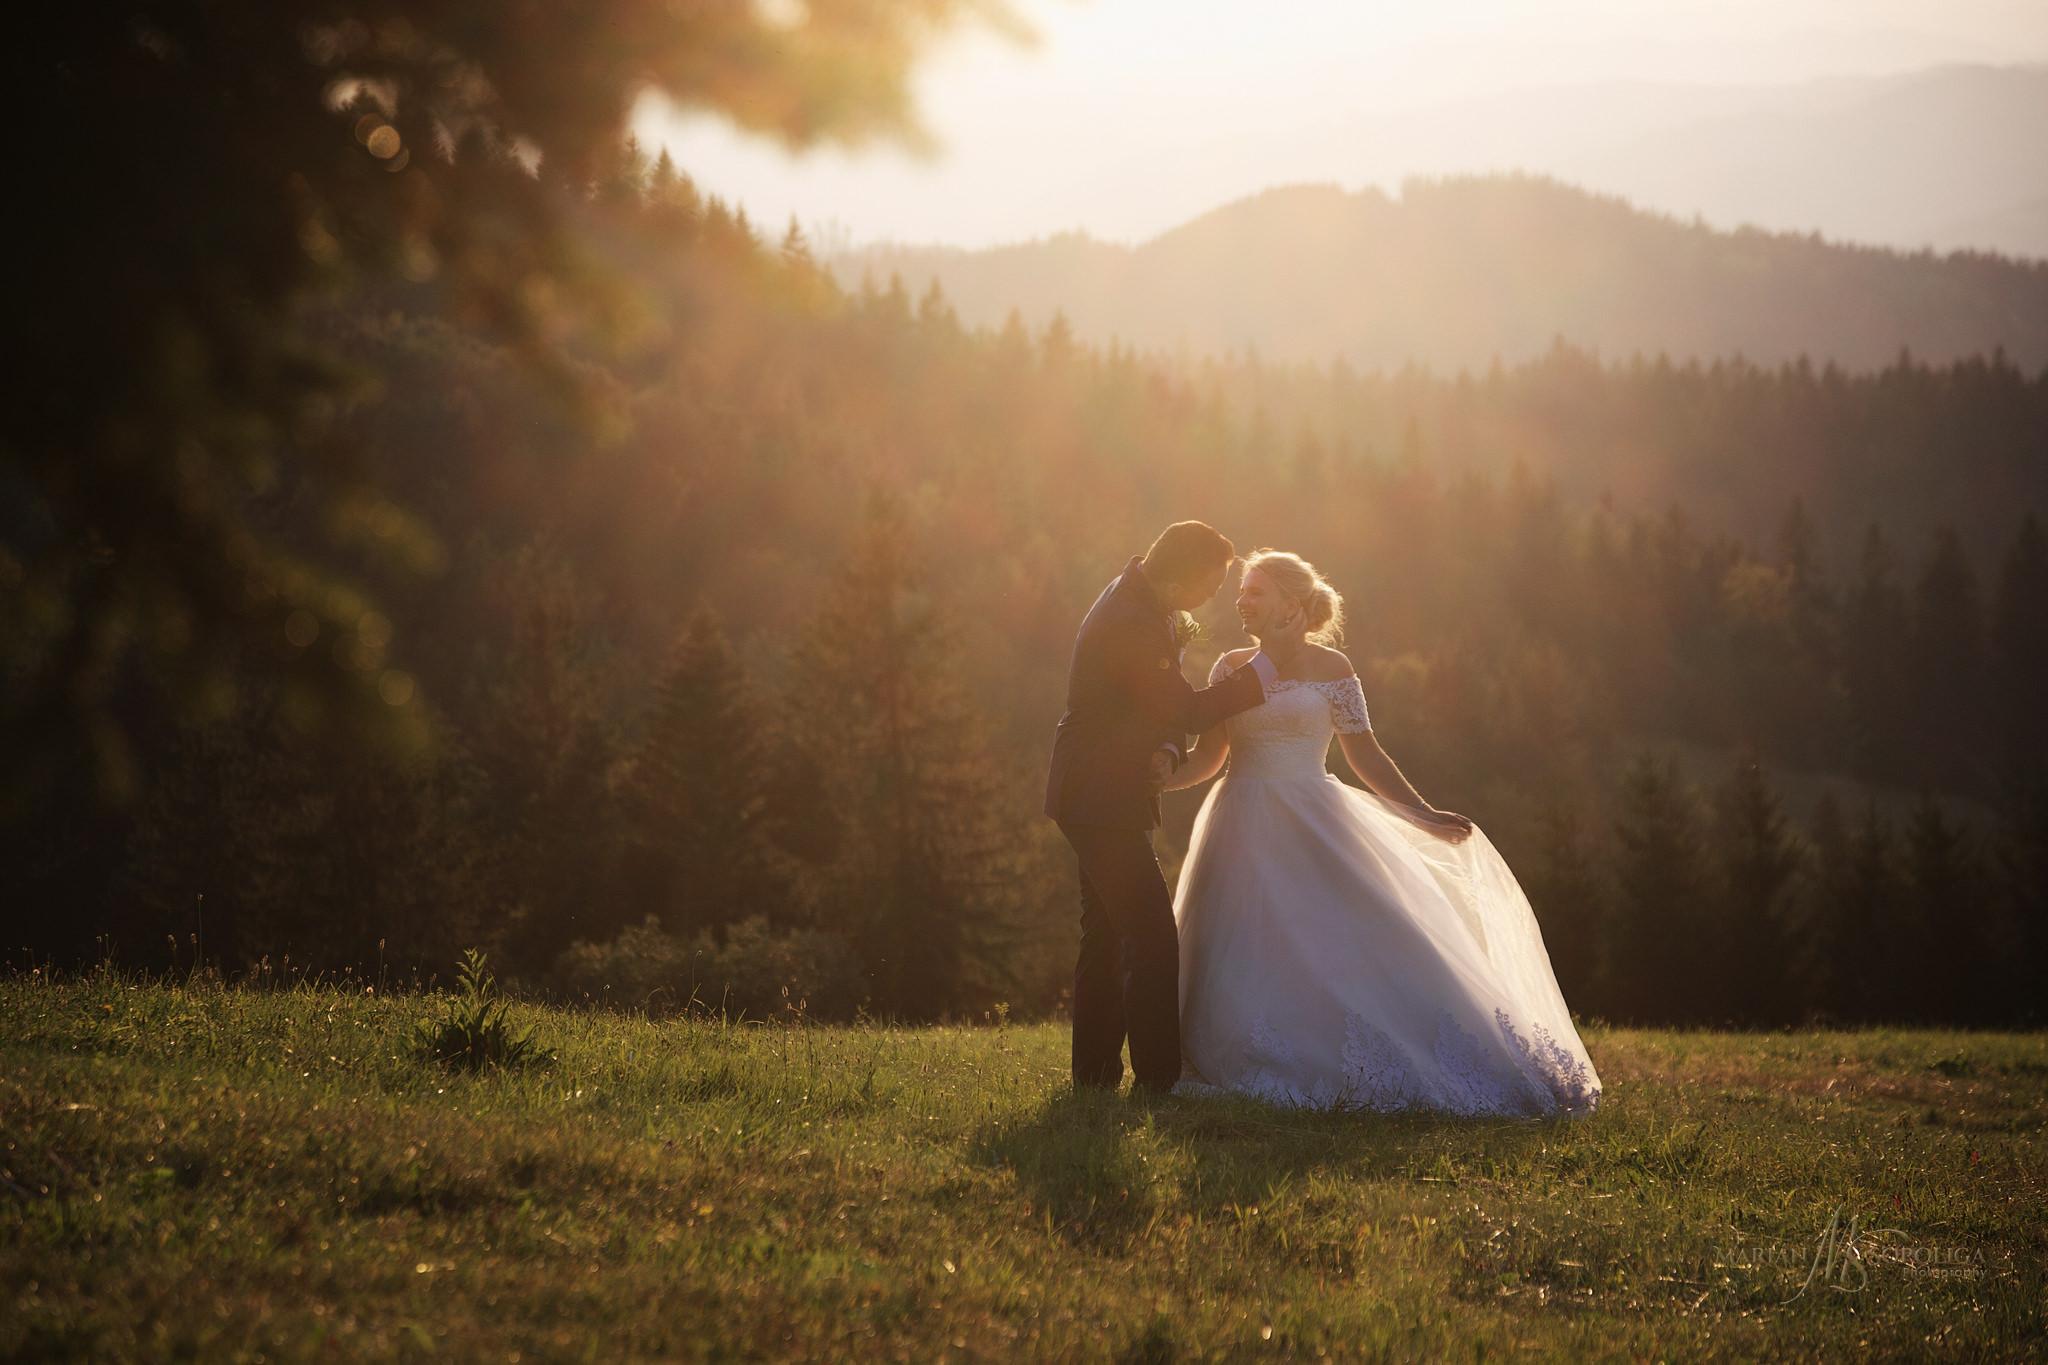 svatebni-fotograf-roznov-pod-radhostem-novomanzelsky-par-na-louc